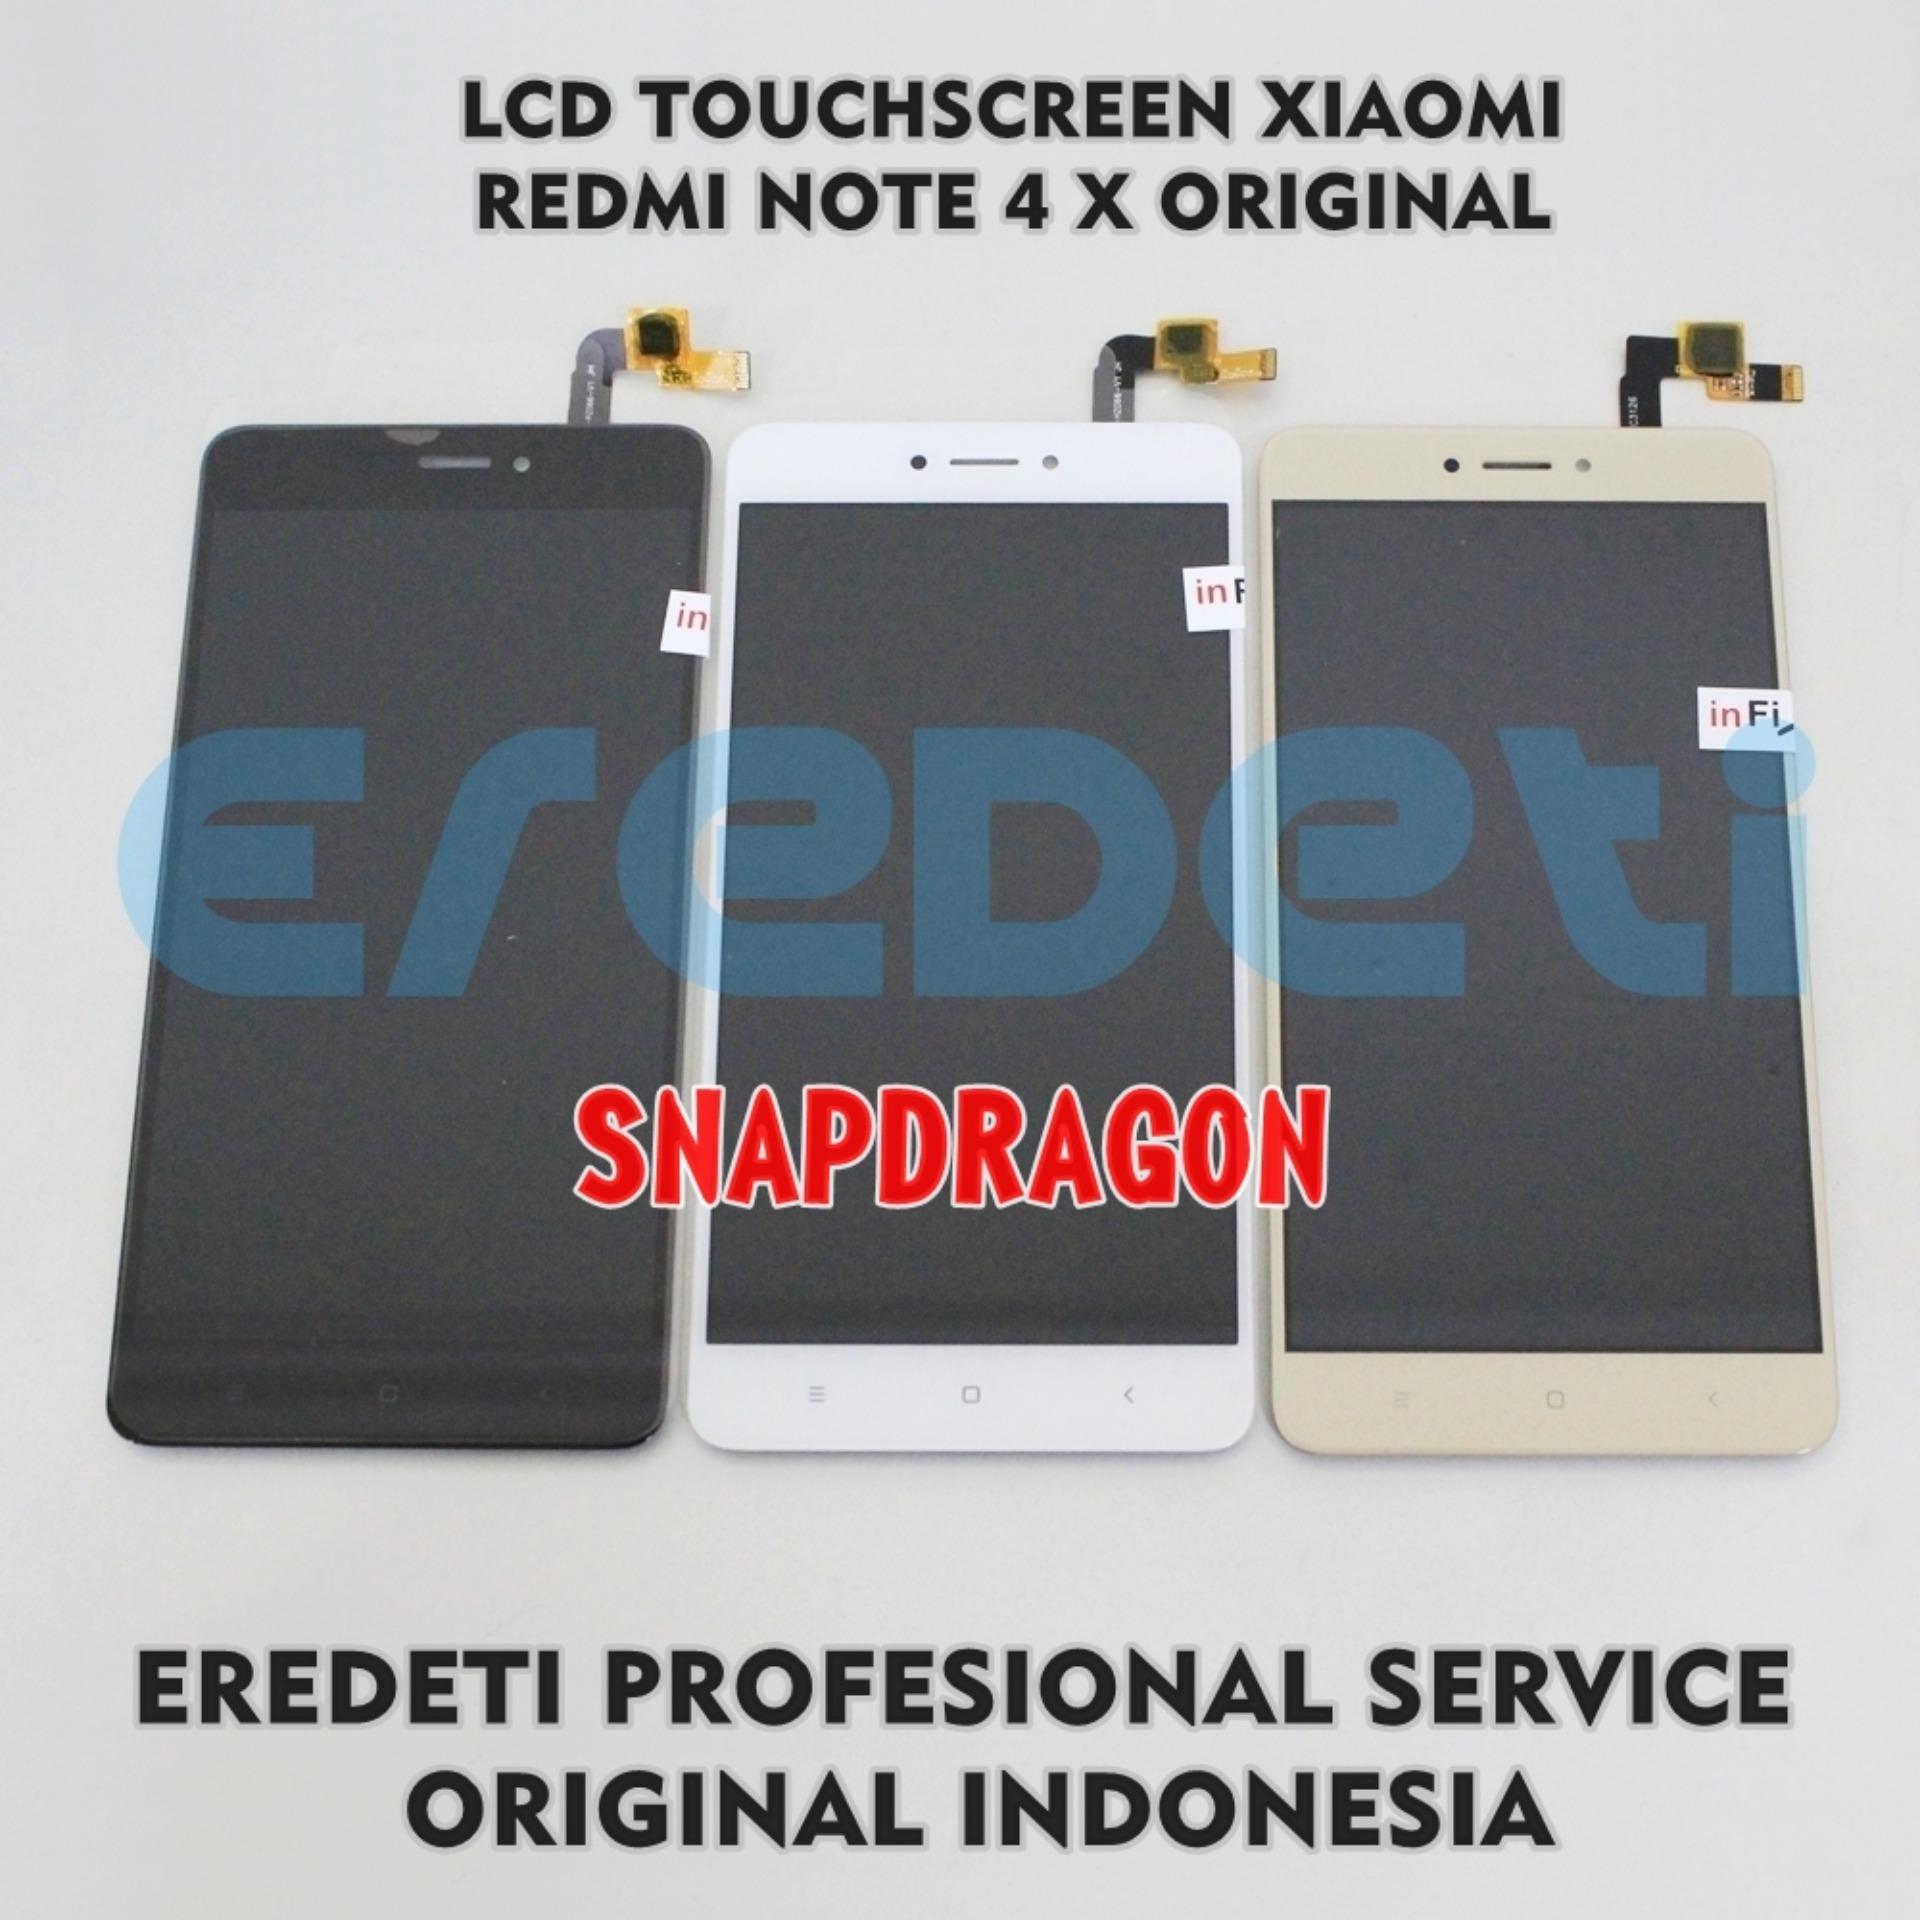 Toko Lcd Touchscreen Xiaomi Redmi Note 4 X Original Snapdragon Termurah